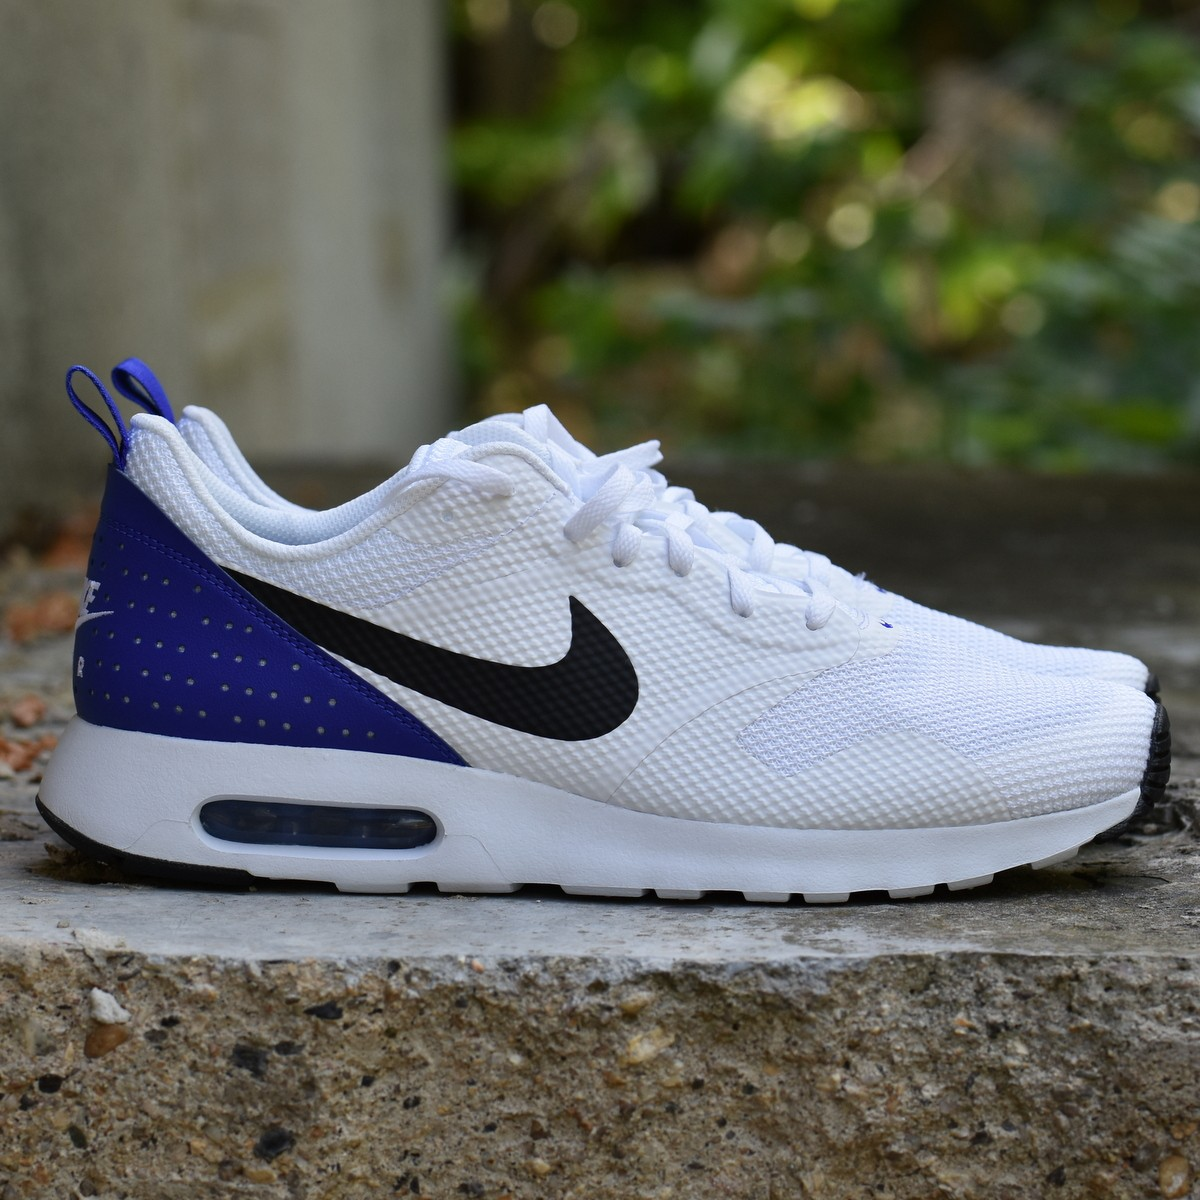 Nike AIR MAX TAVAS Pánské boty EU 41 705149-104 9a81d9f5af